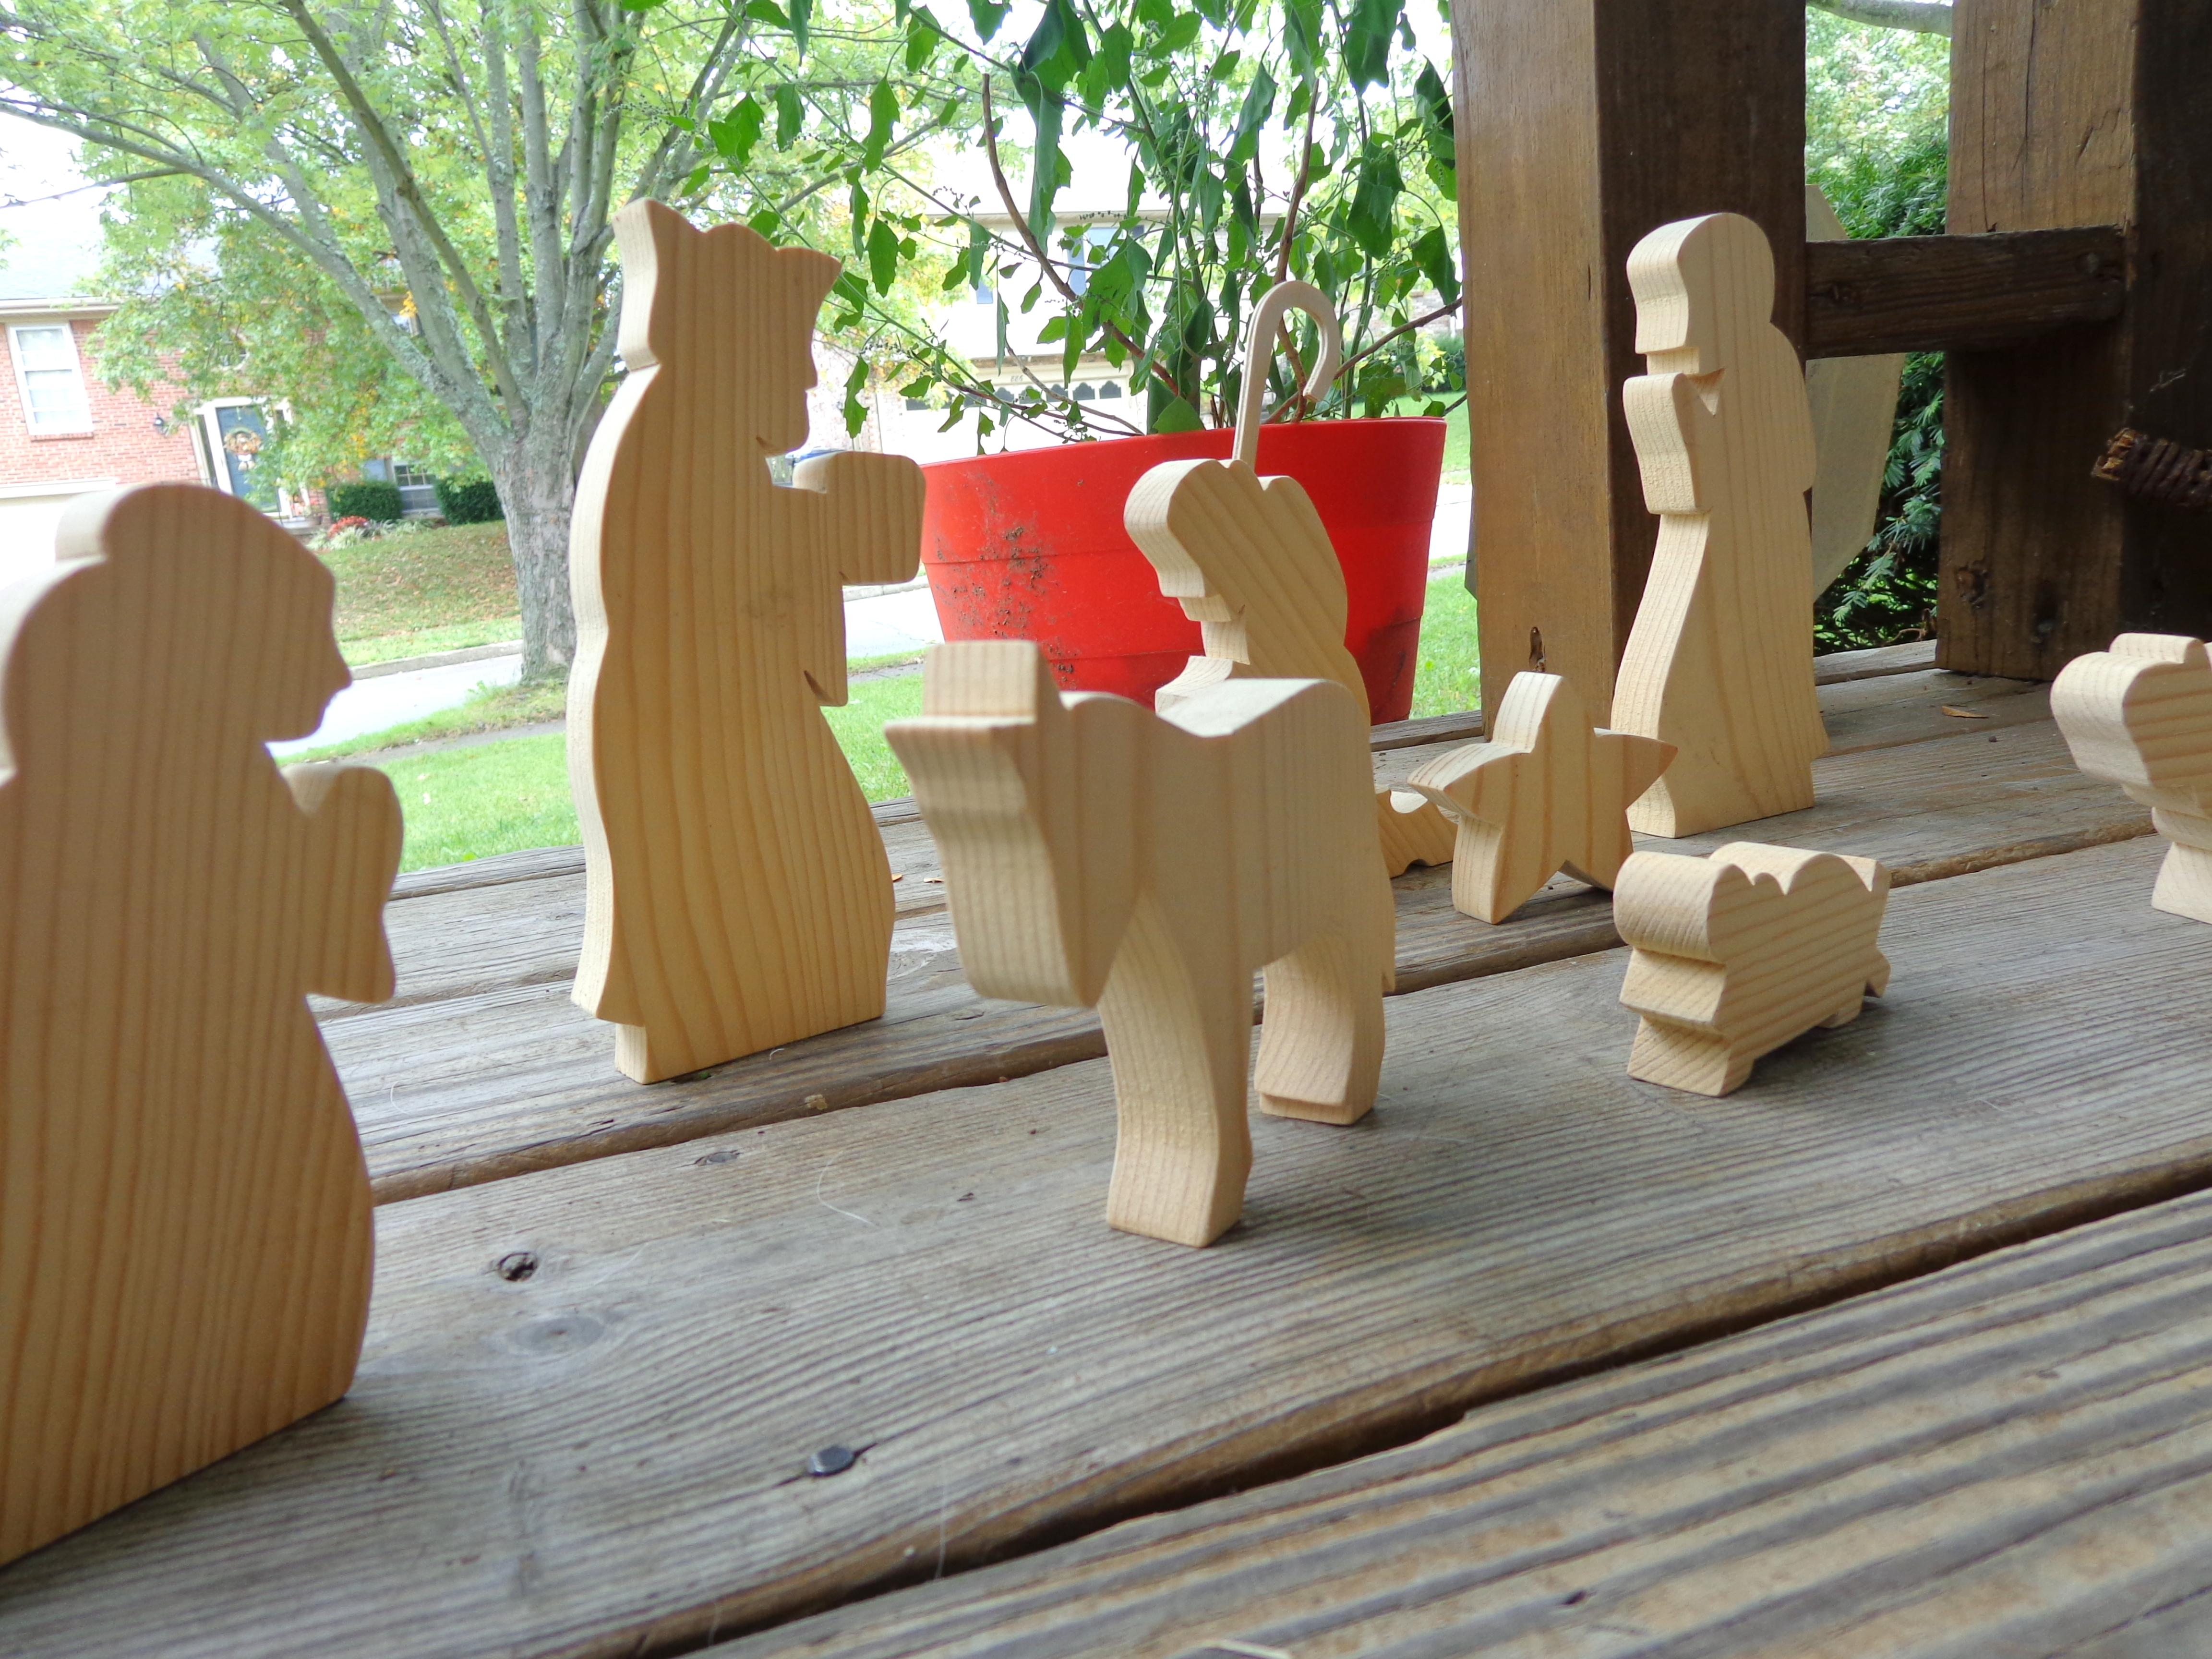 Nativity Set Plans Exterior Wood Varnishes Wood Kits To  : dsc01189 from s3.amazonaws.com size 4608 x 3456 jpeg 6058kB